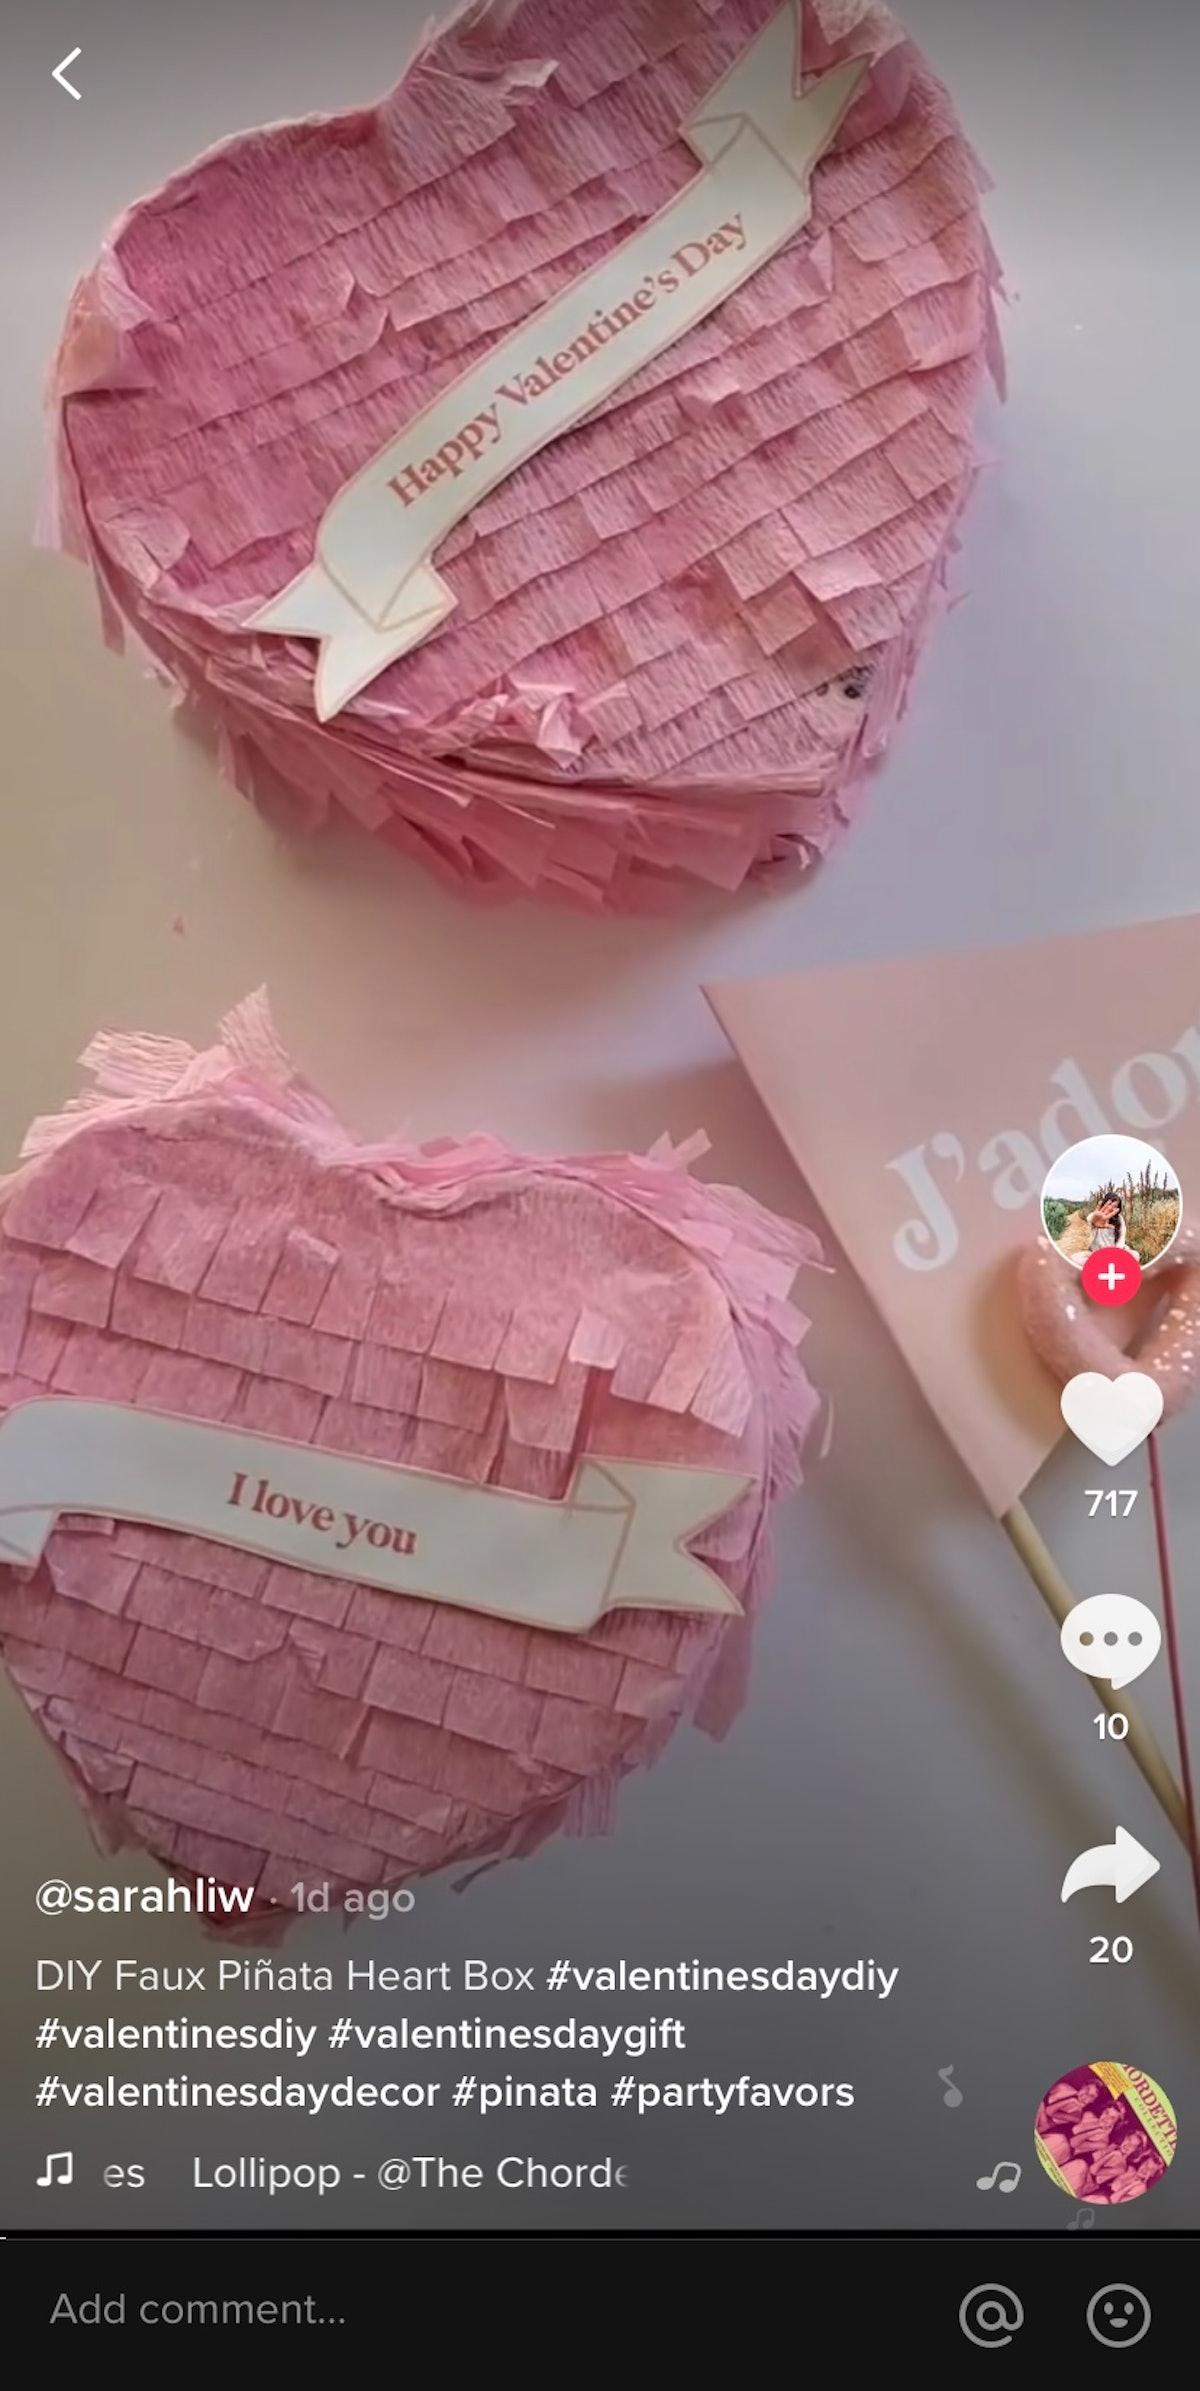 A TikTok user creates a heart-shaped piñata for a DIY Valentine's Day gift.